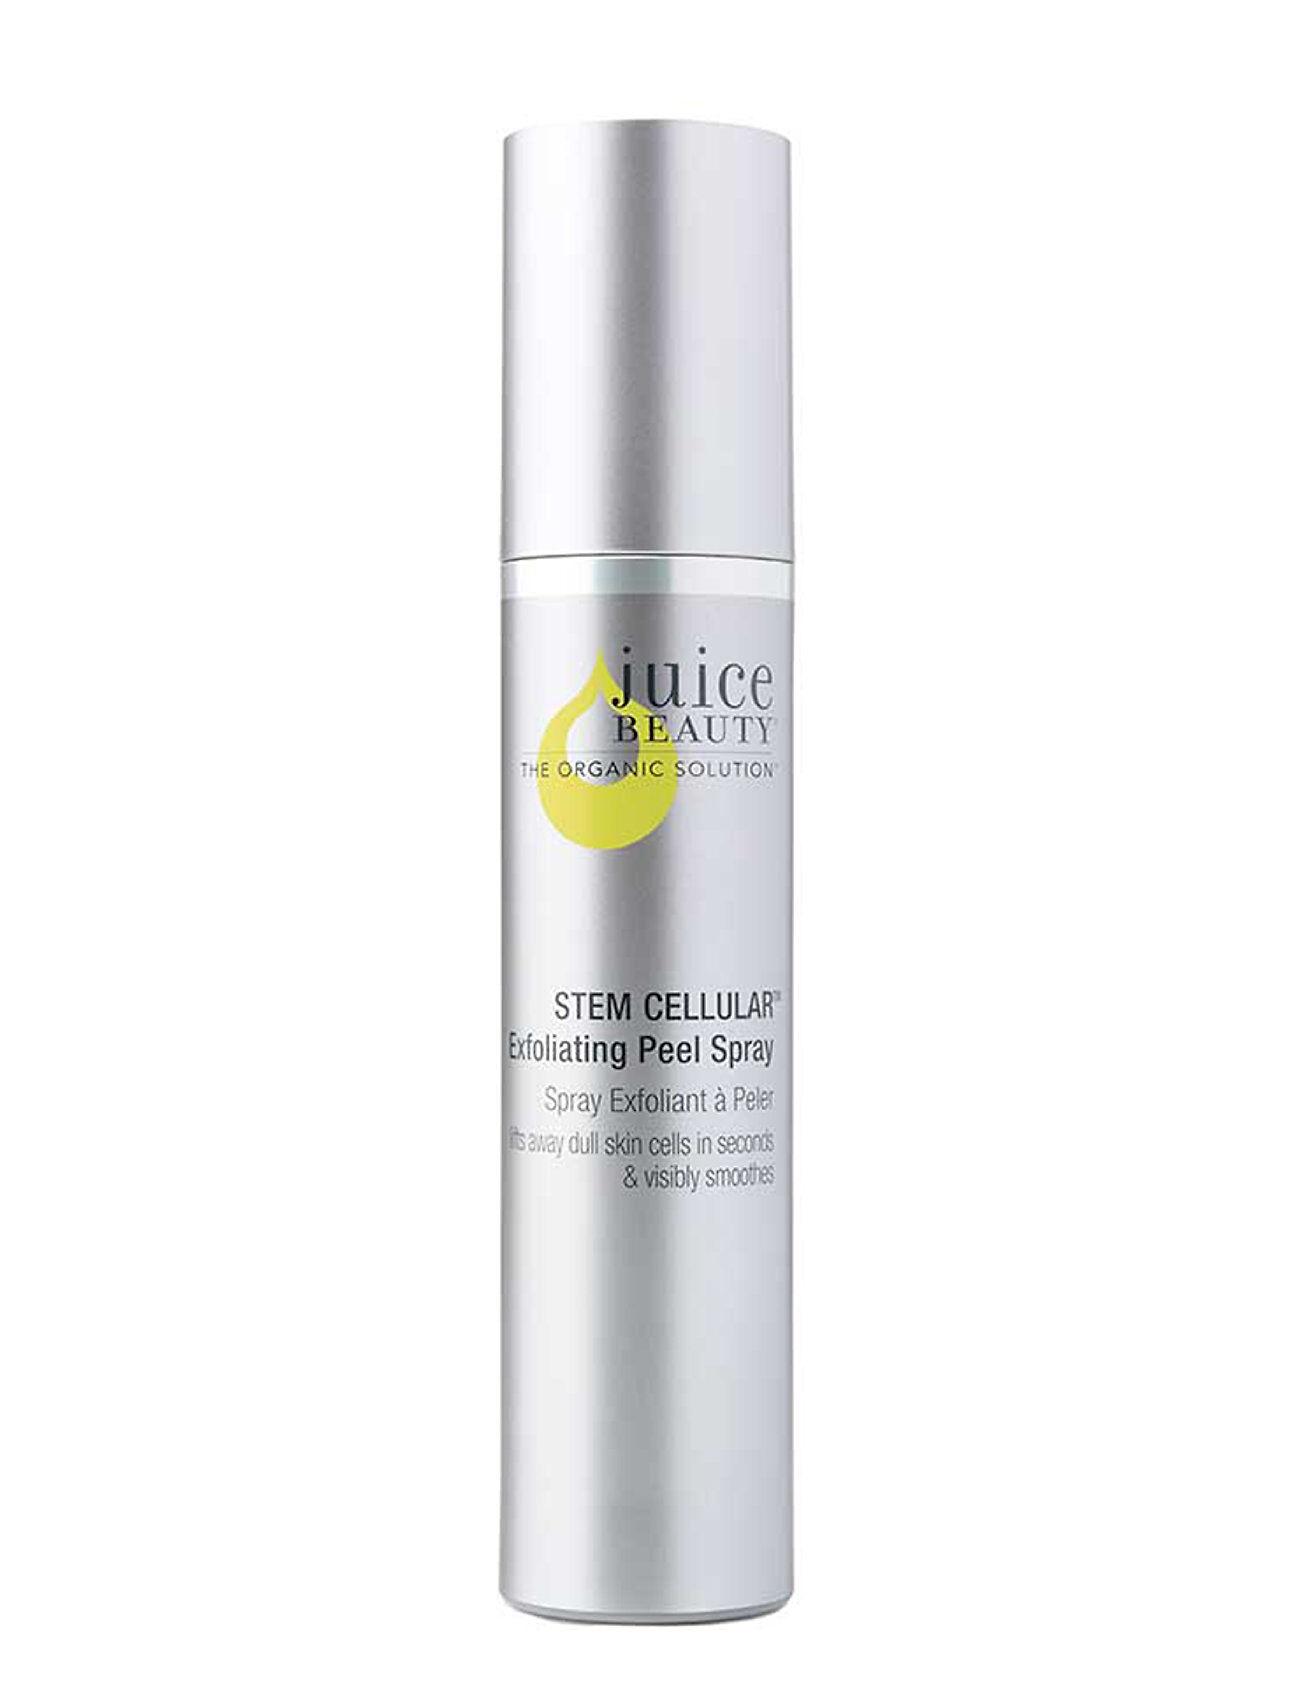 Juice Beauty Stem Cellular™ Exfoliating Peel Spray